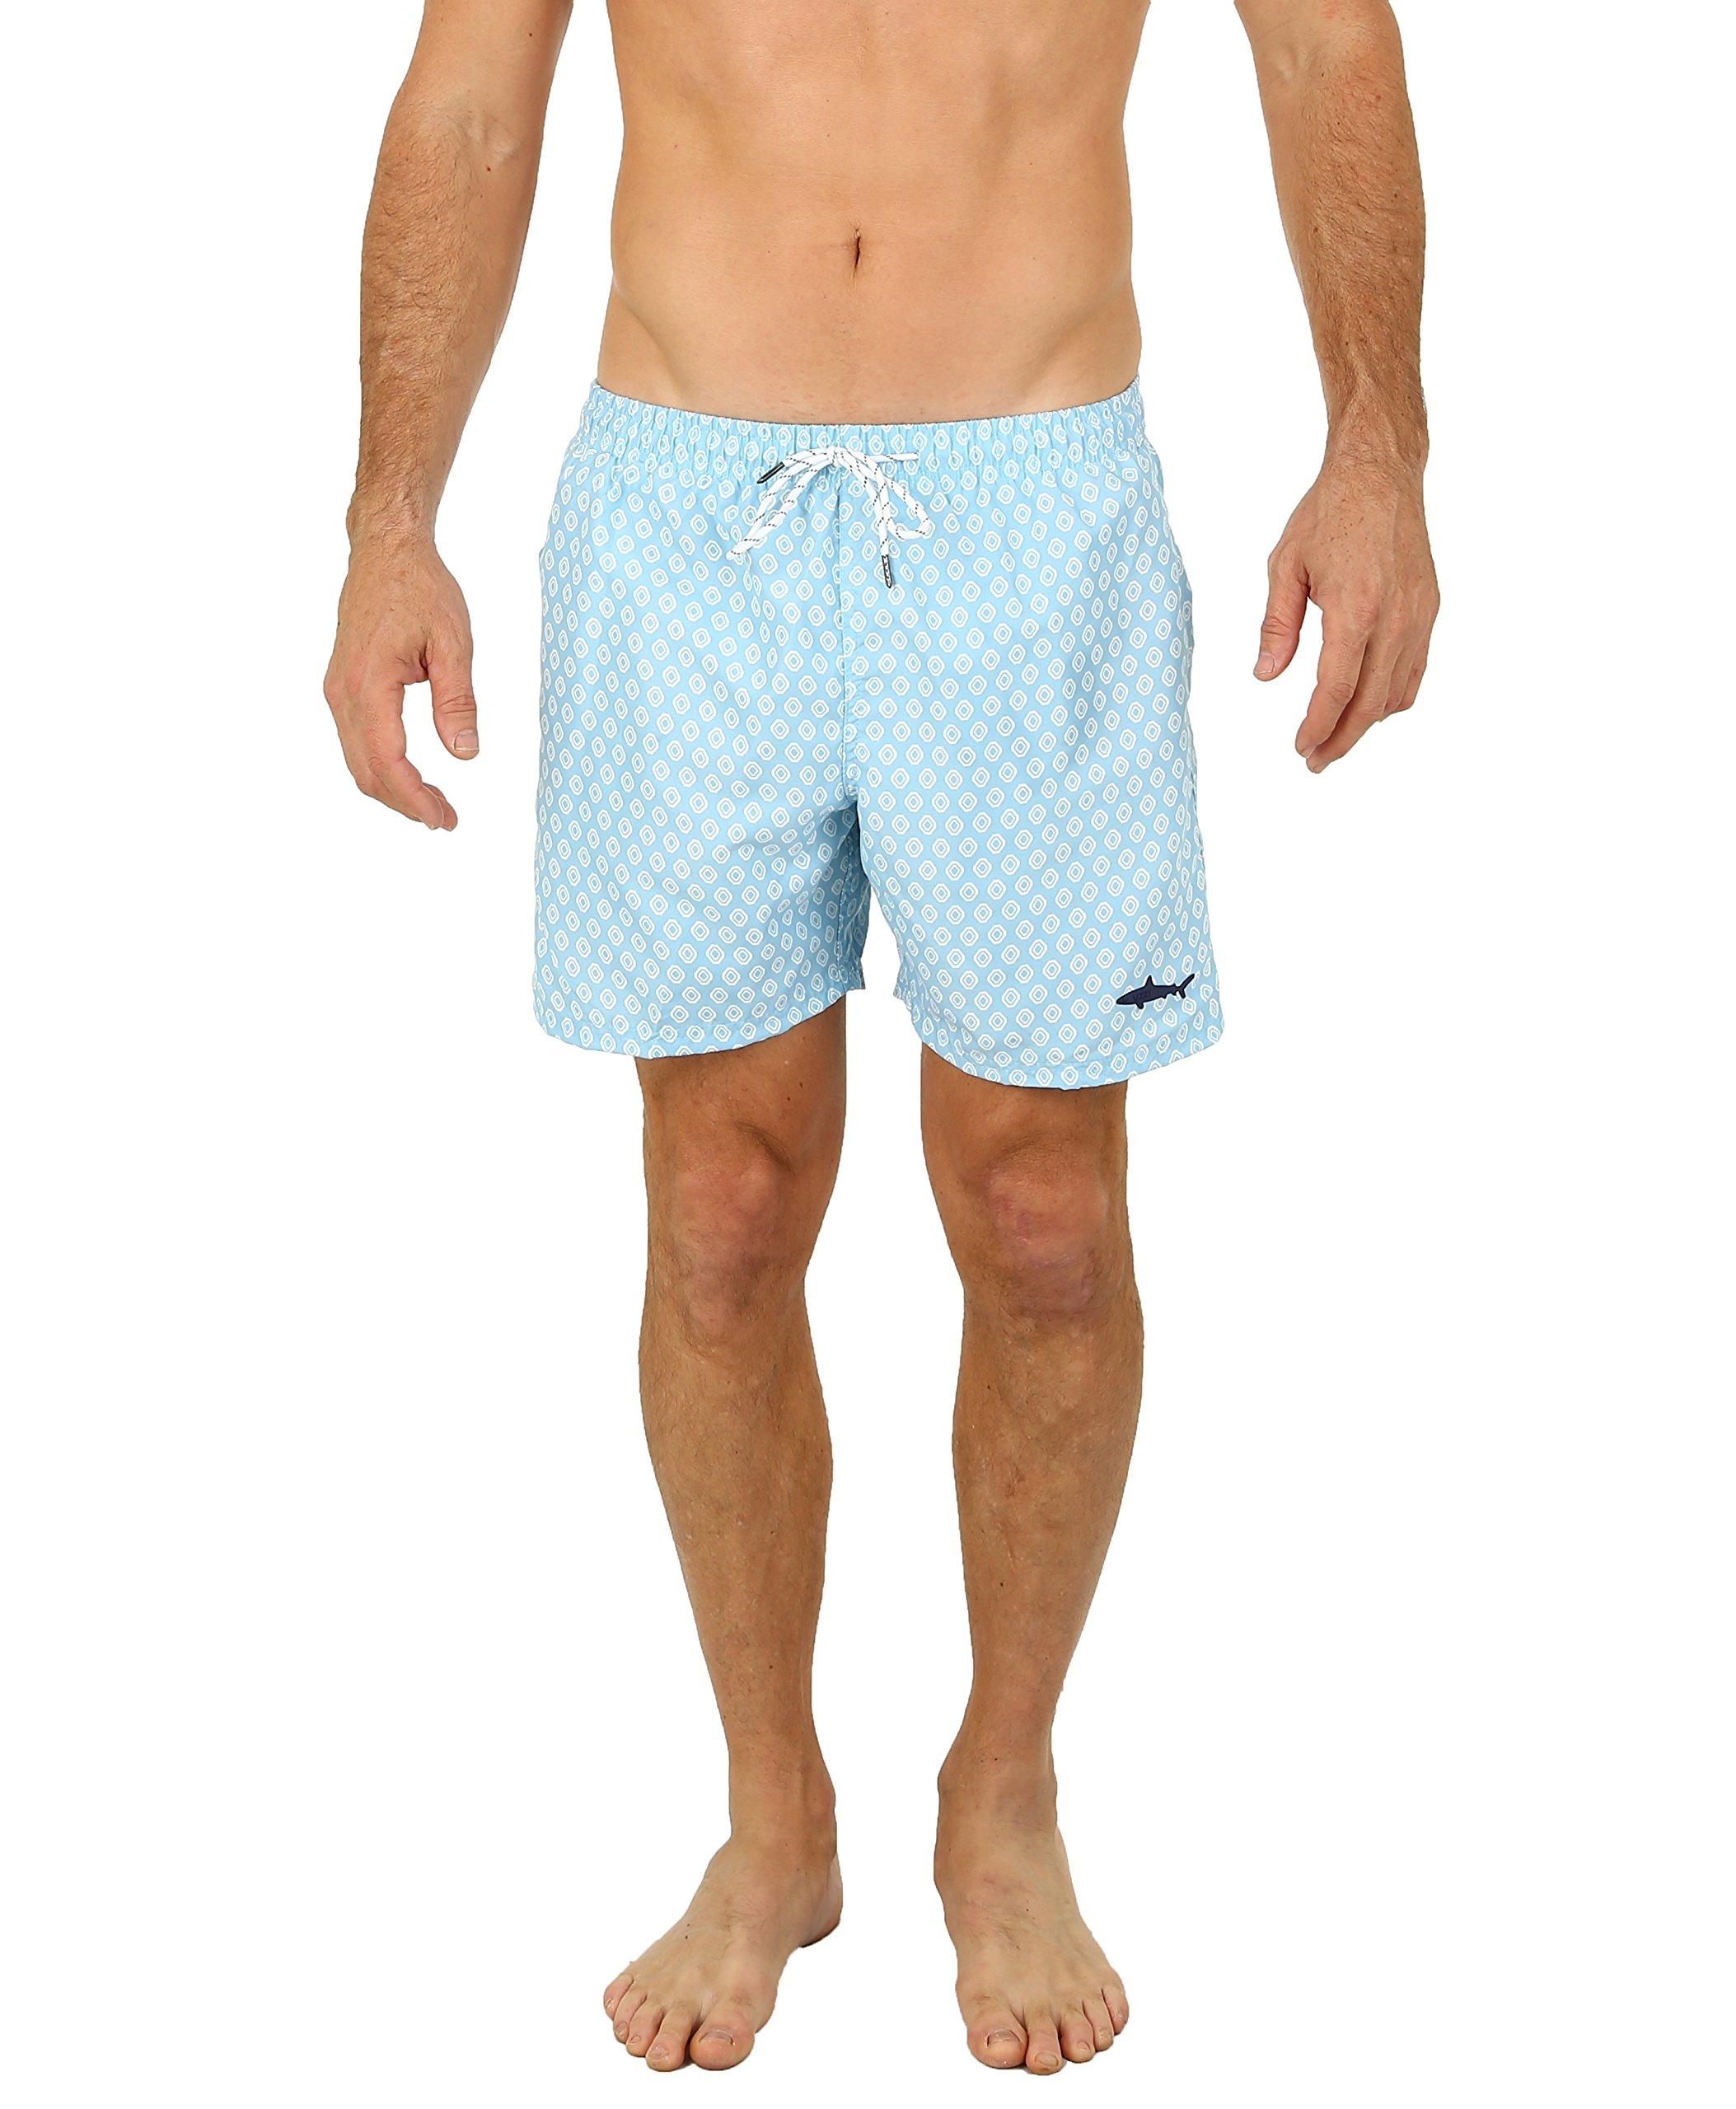 UZZI Men's Malibu Swim Trunks Aqua M